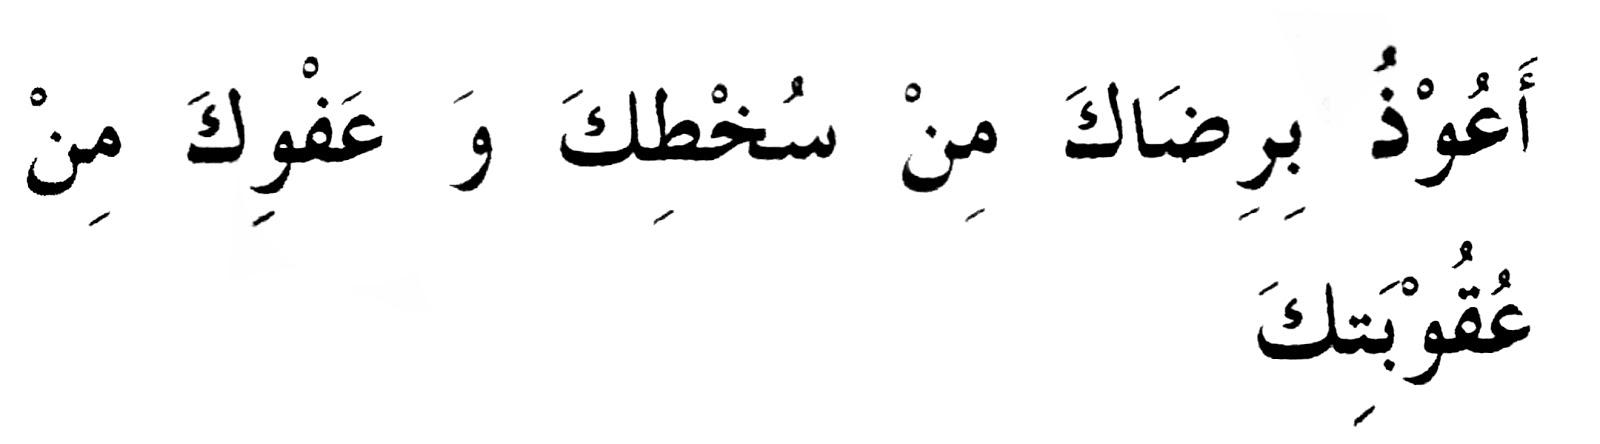 Doa Lailatul Qadar | kajian islam